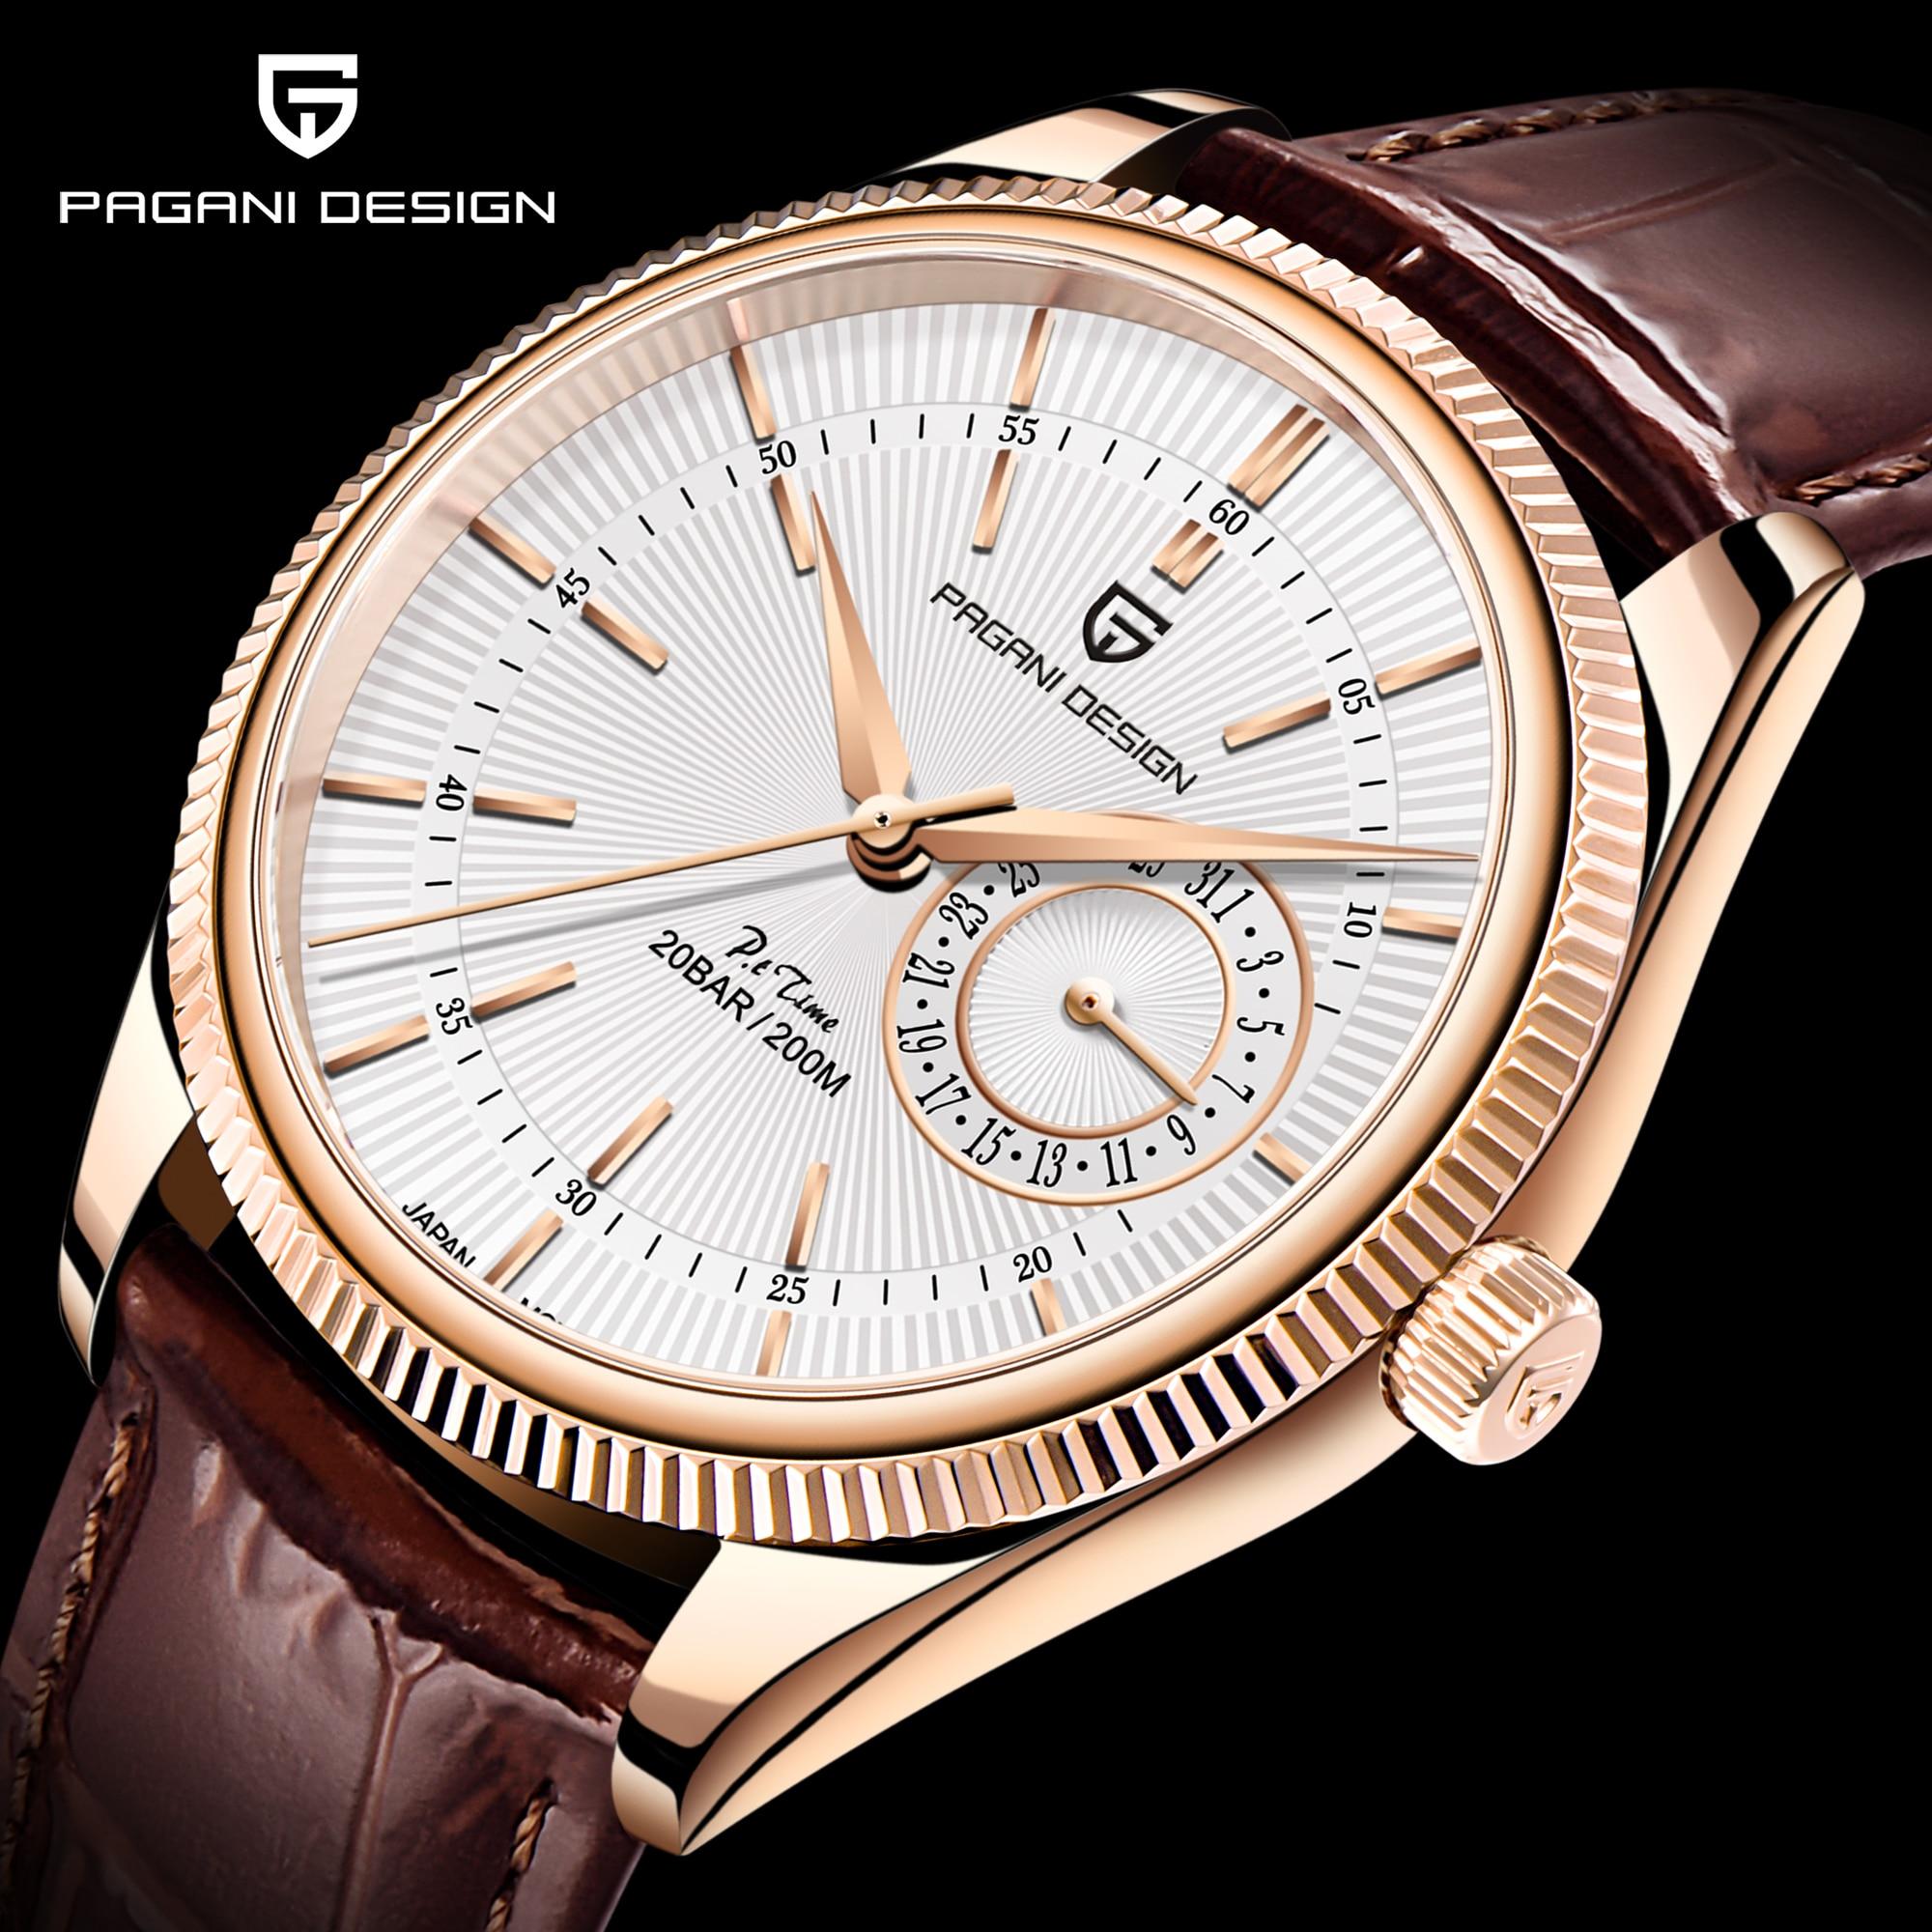 Pagani Design Top Brand New 2021 Mechanical Second Quartz Watch Luxury Sapphire 200m Waterproof Men's Clock